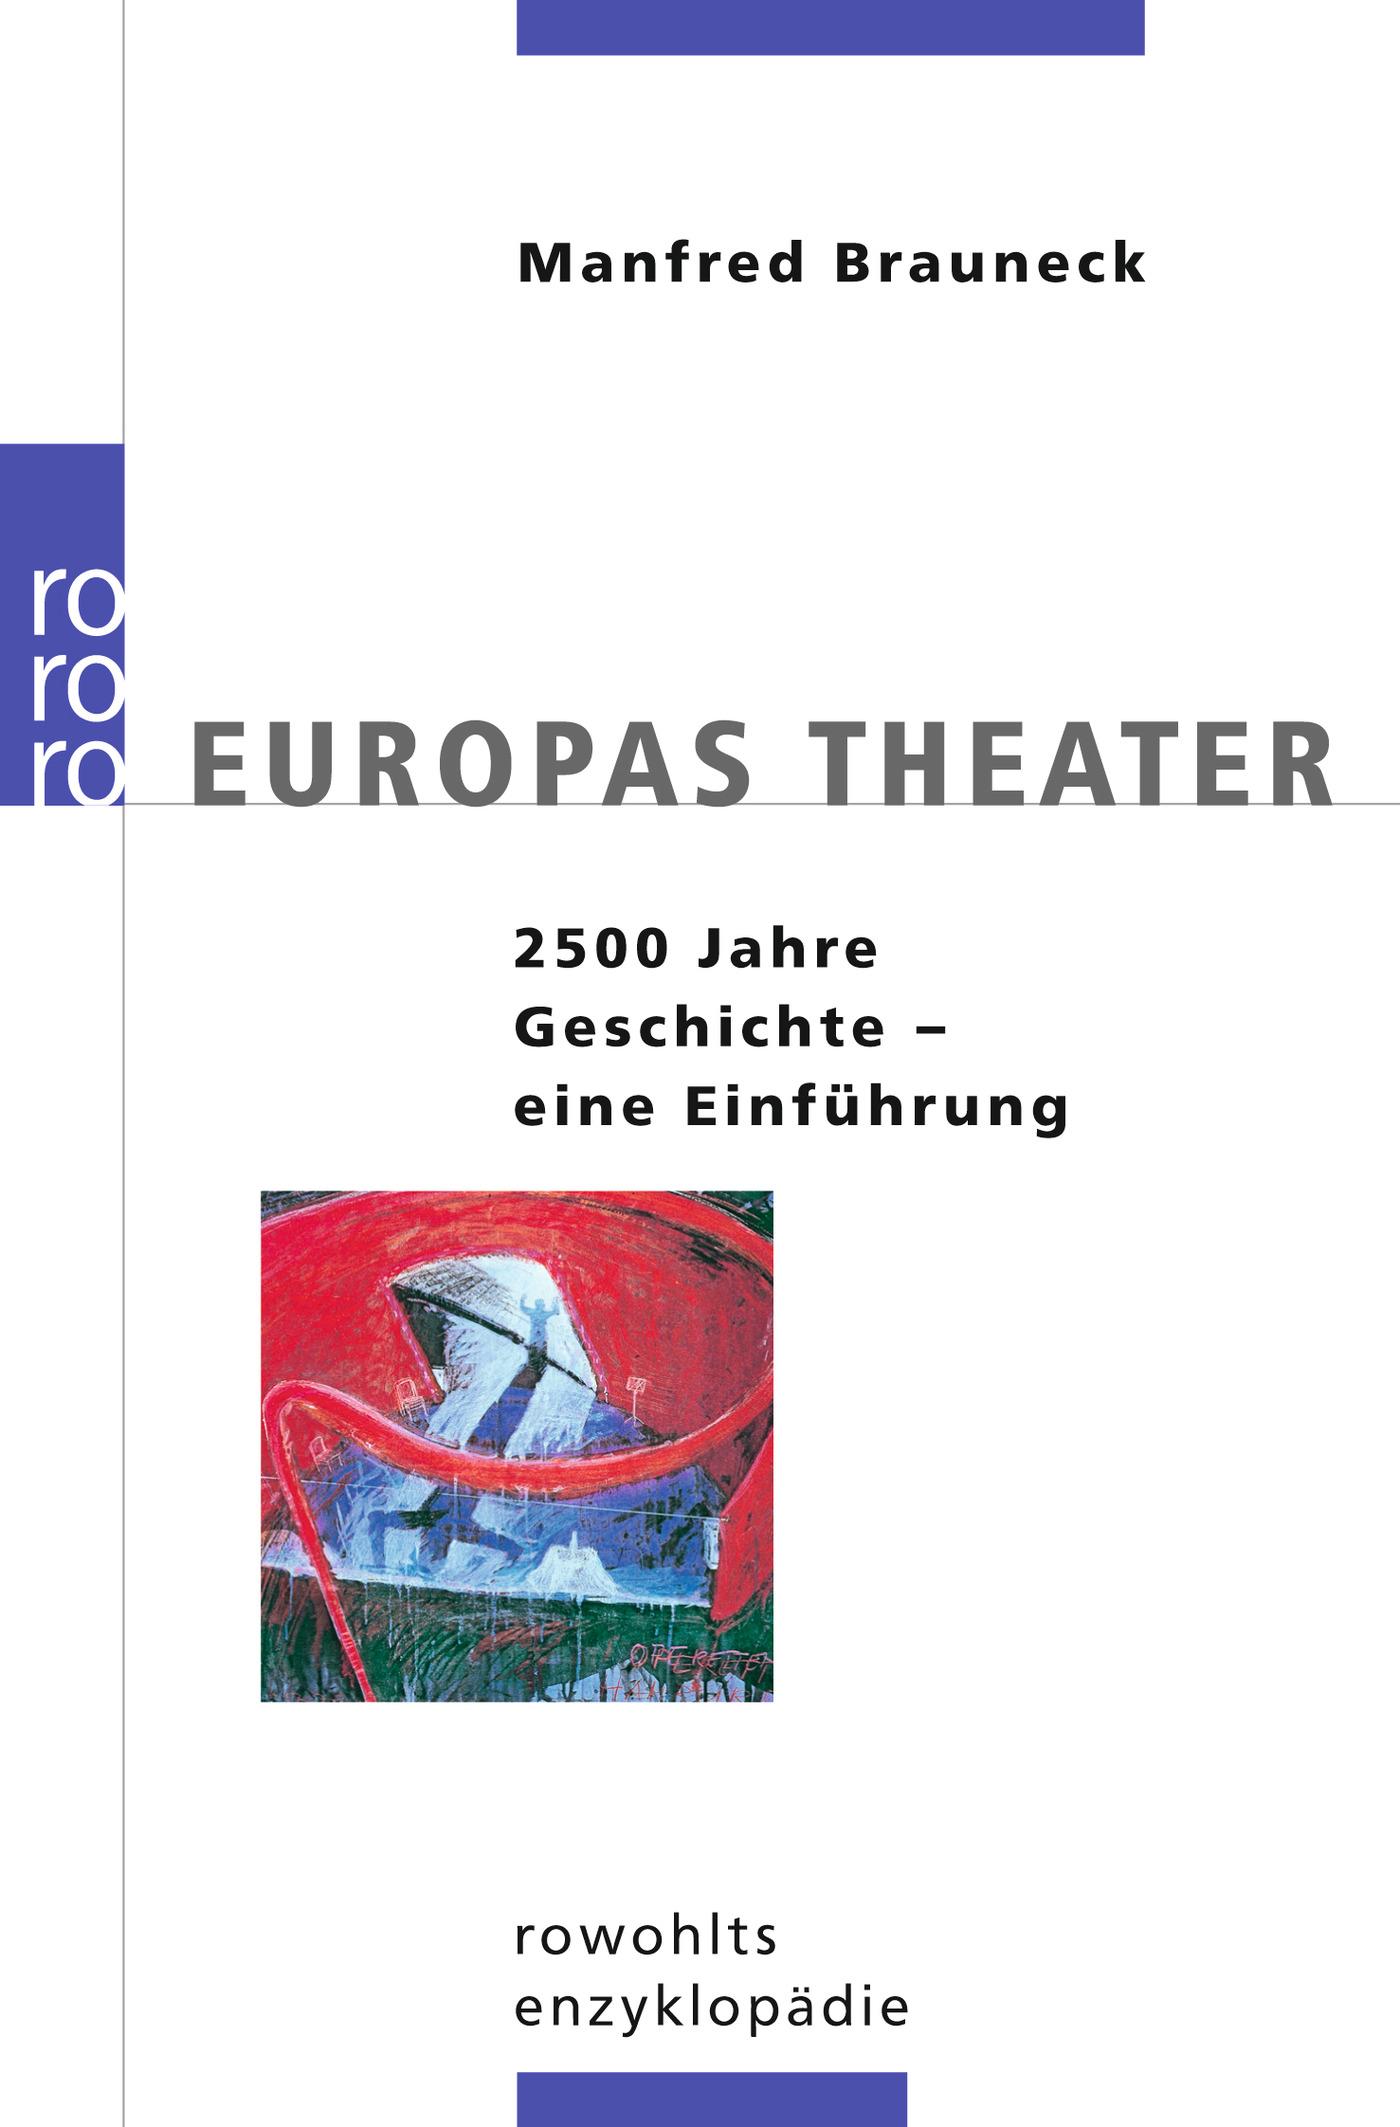 Europas Theater Manfred Brauneck